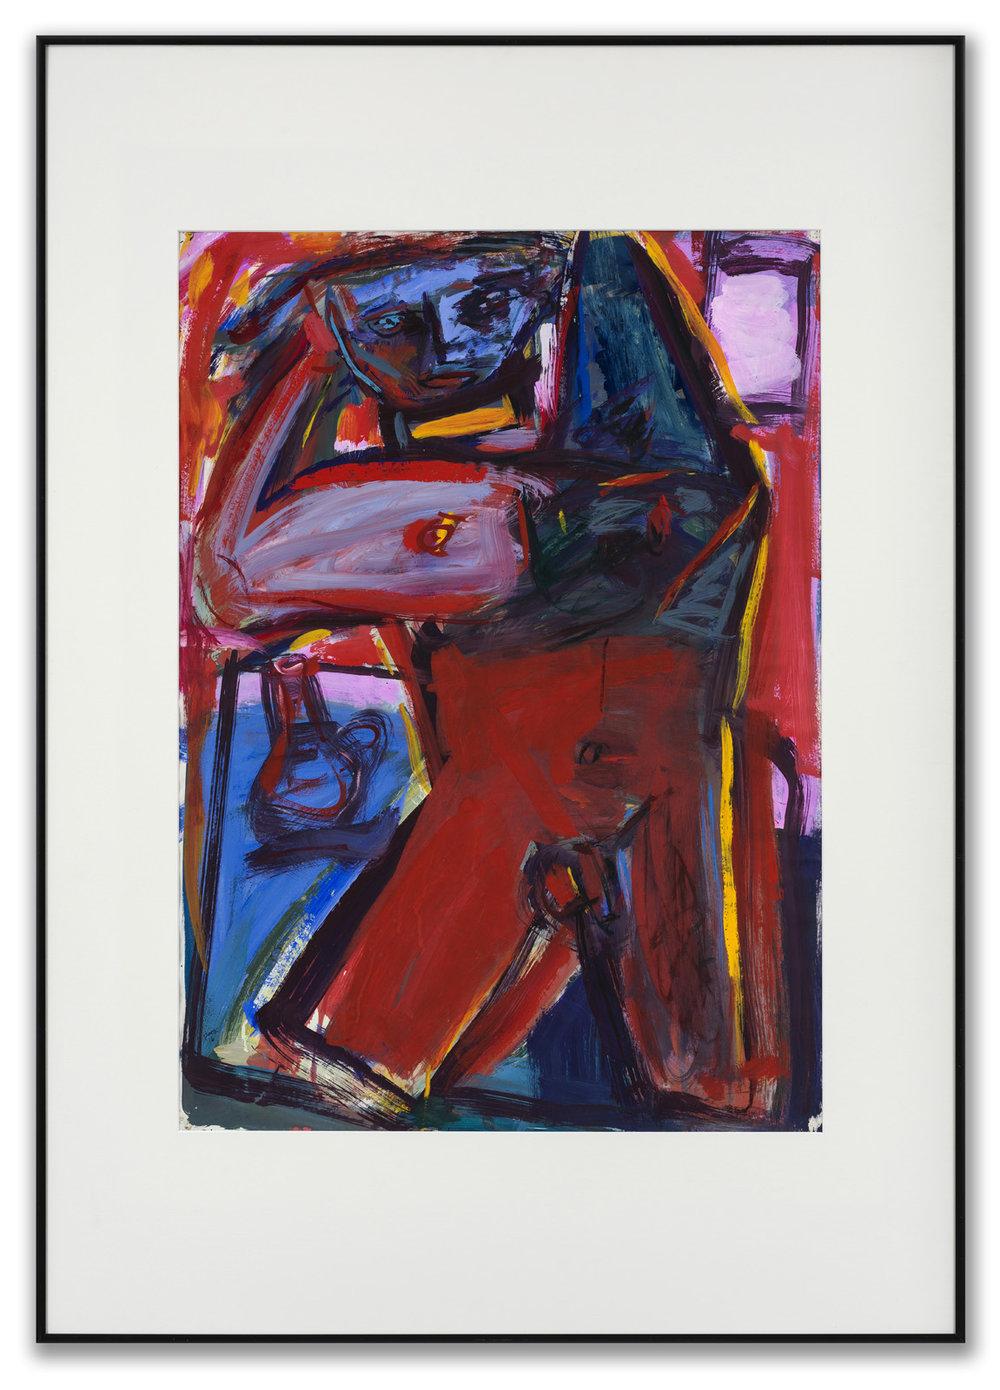 Ian Cook, R.S.W., (Scottish b. 1951), Figure 18, 2016.